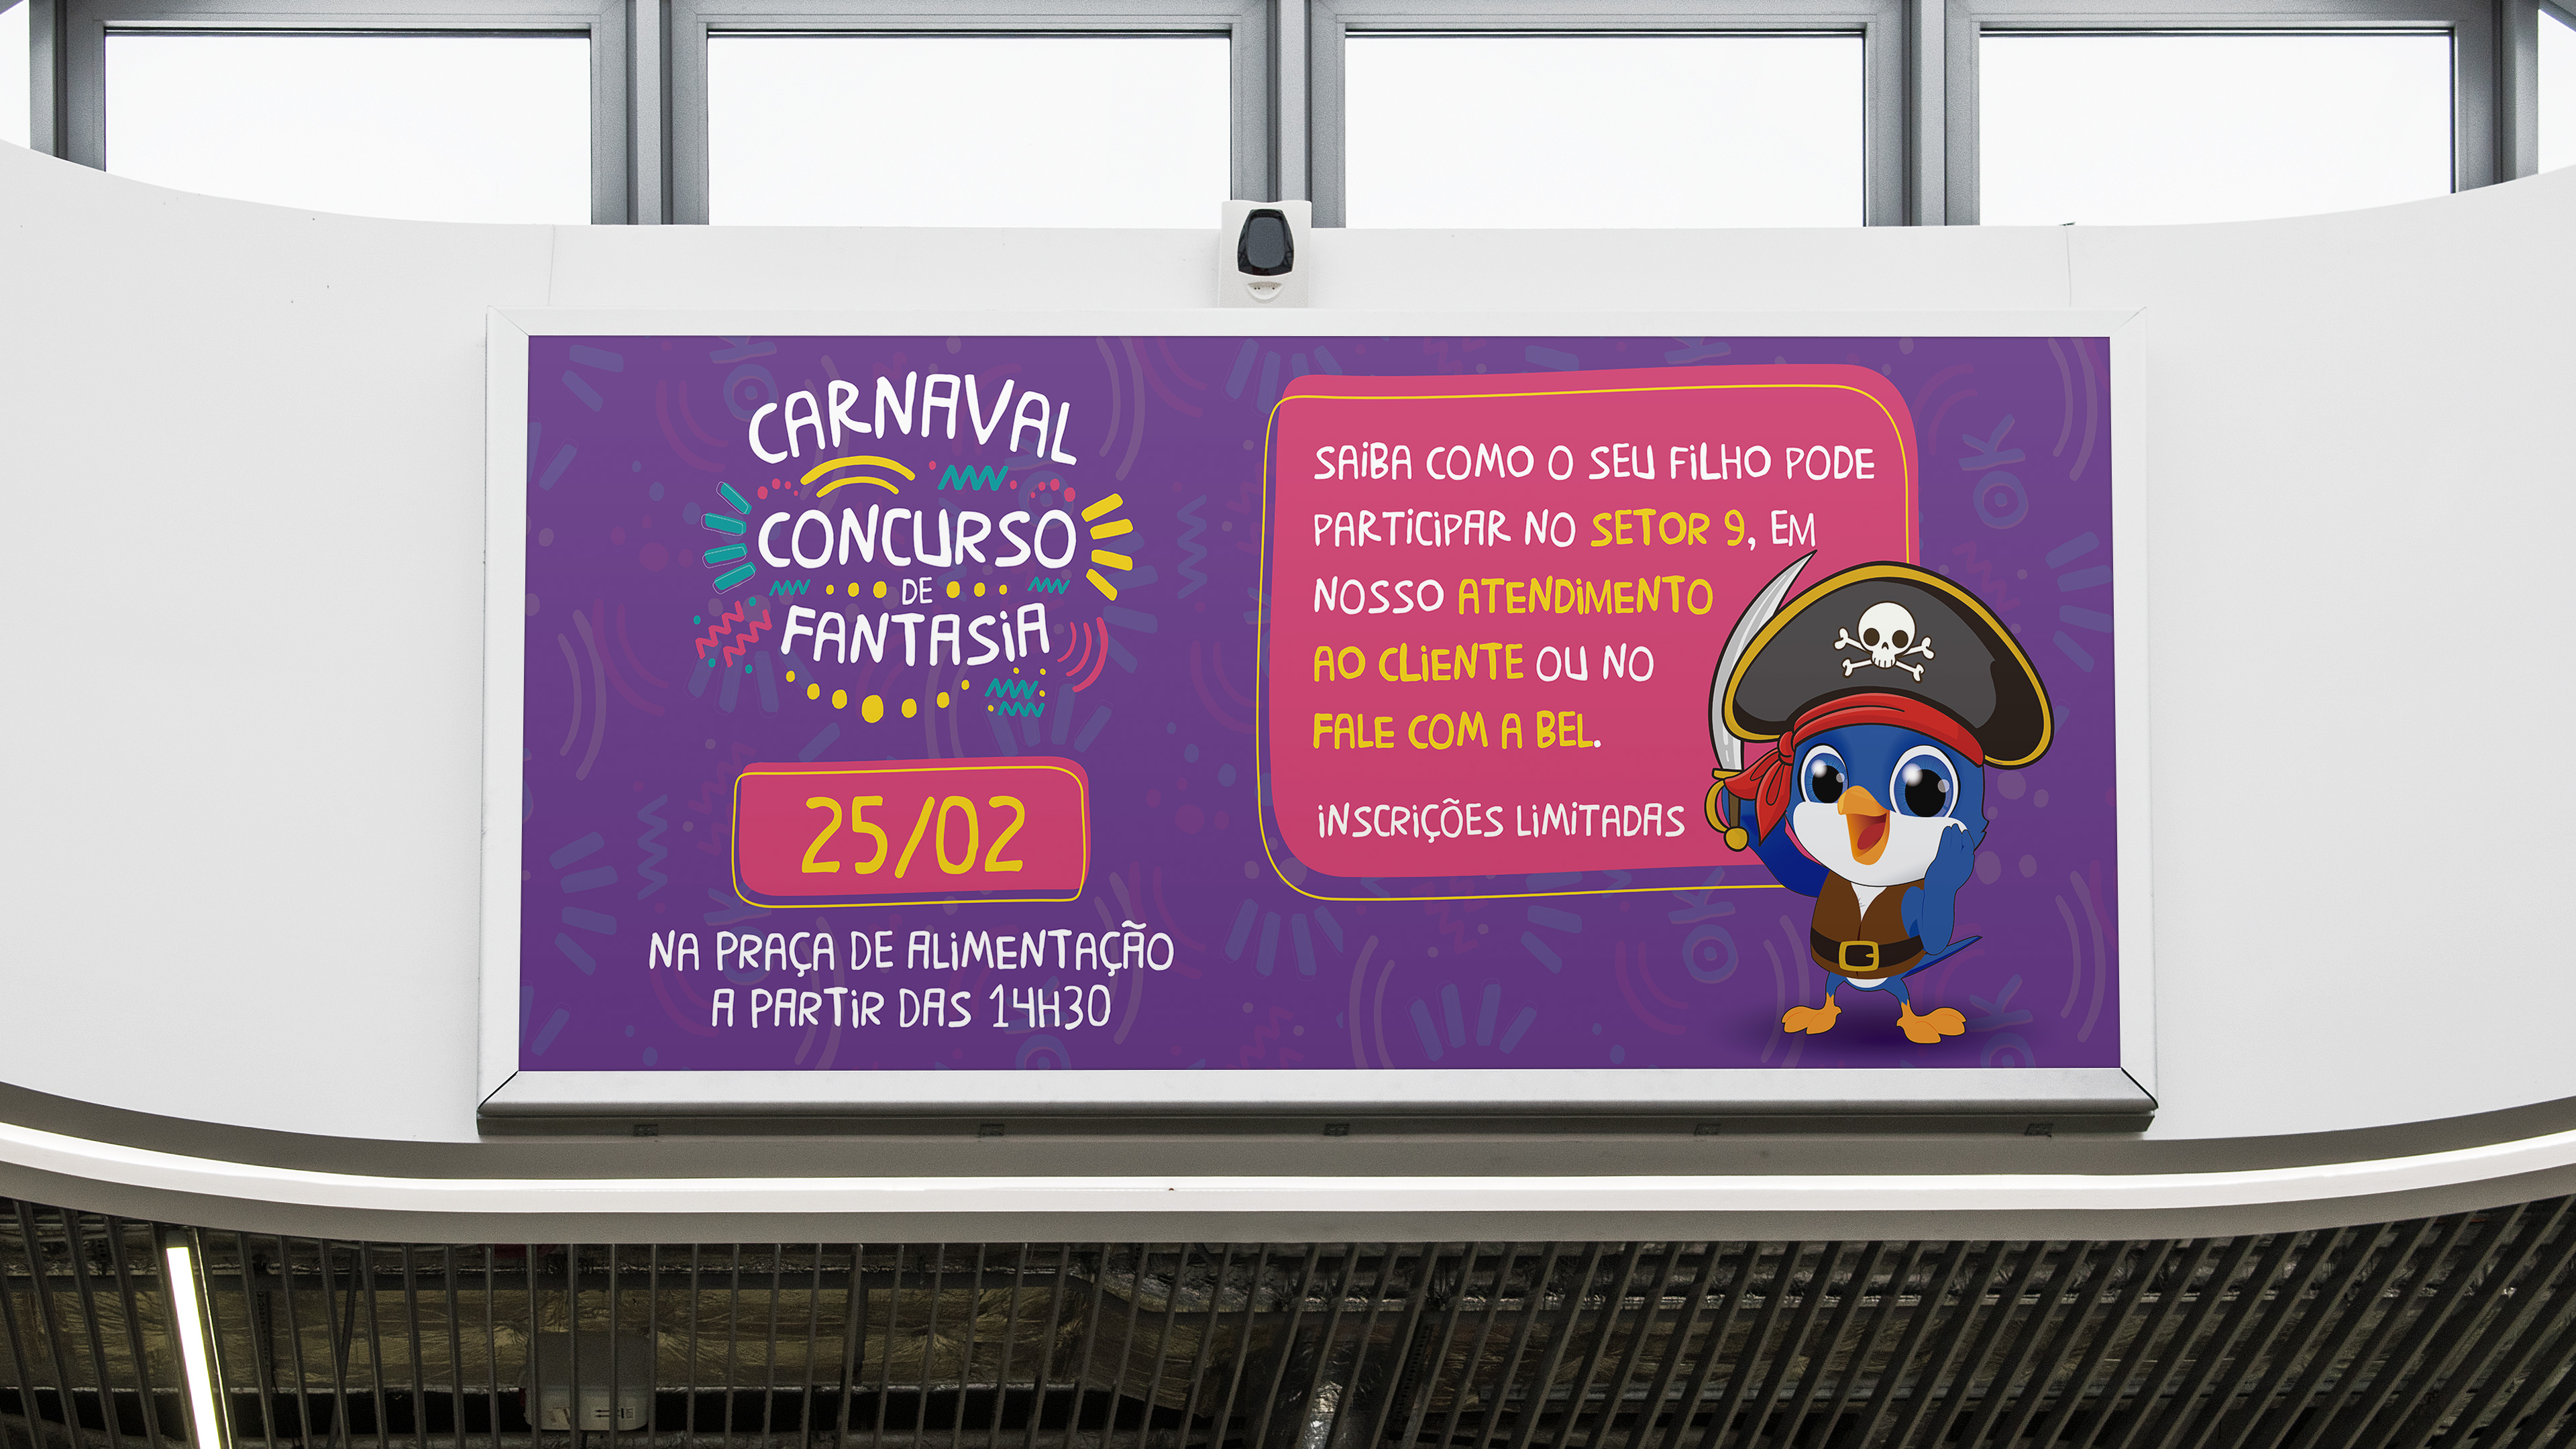 Carnaval-2020-banner-03